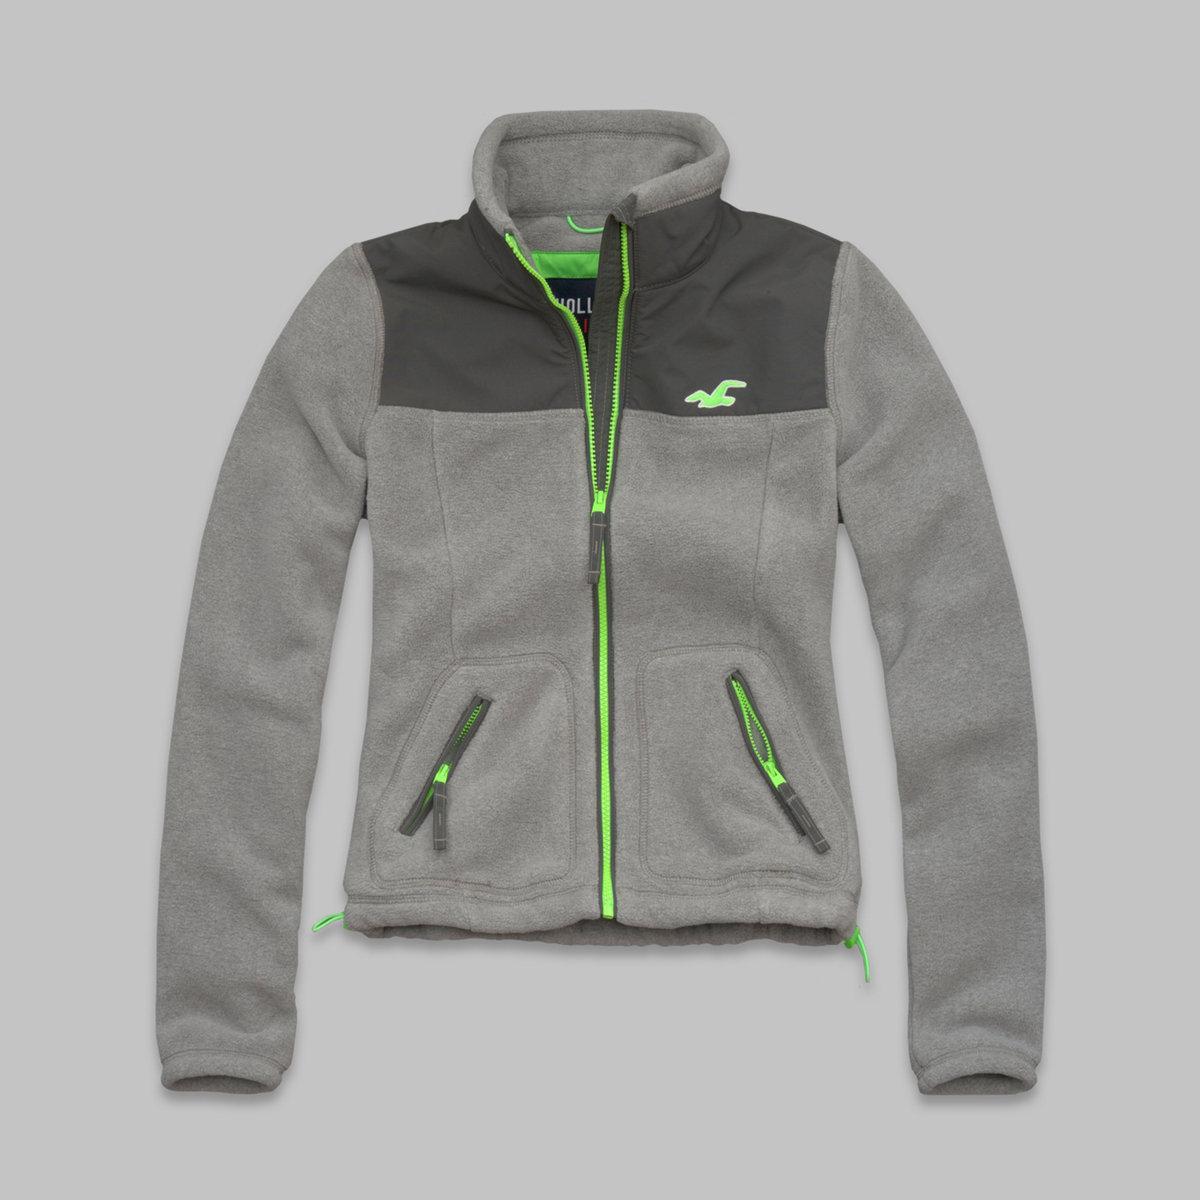 Hollister So Cal Oceanside Fleece Jacket